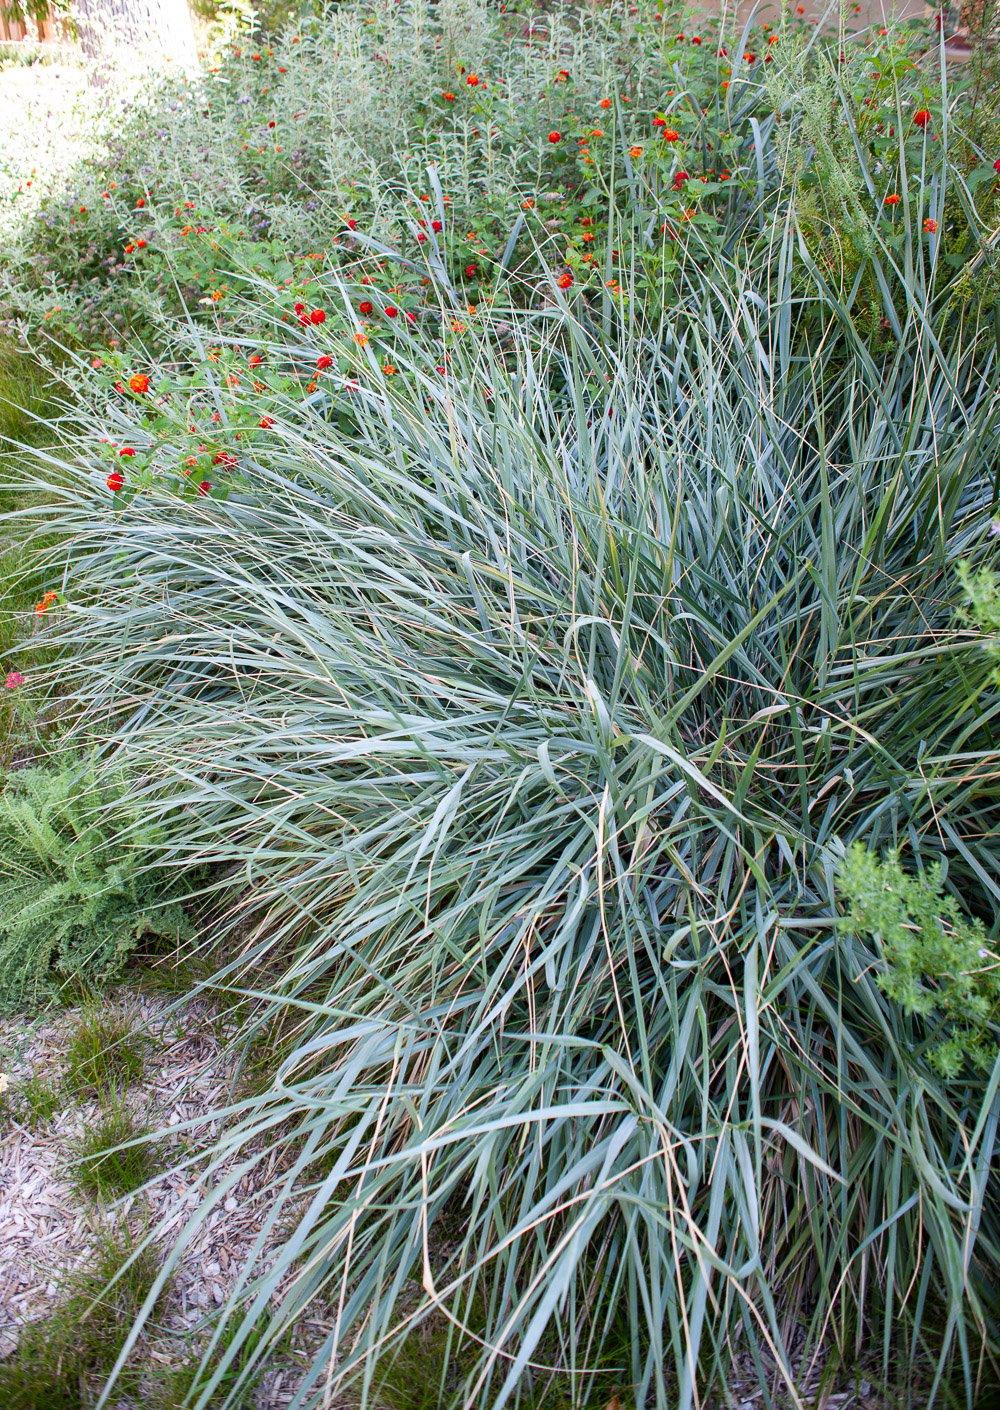 Giant rye ornamental grass